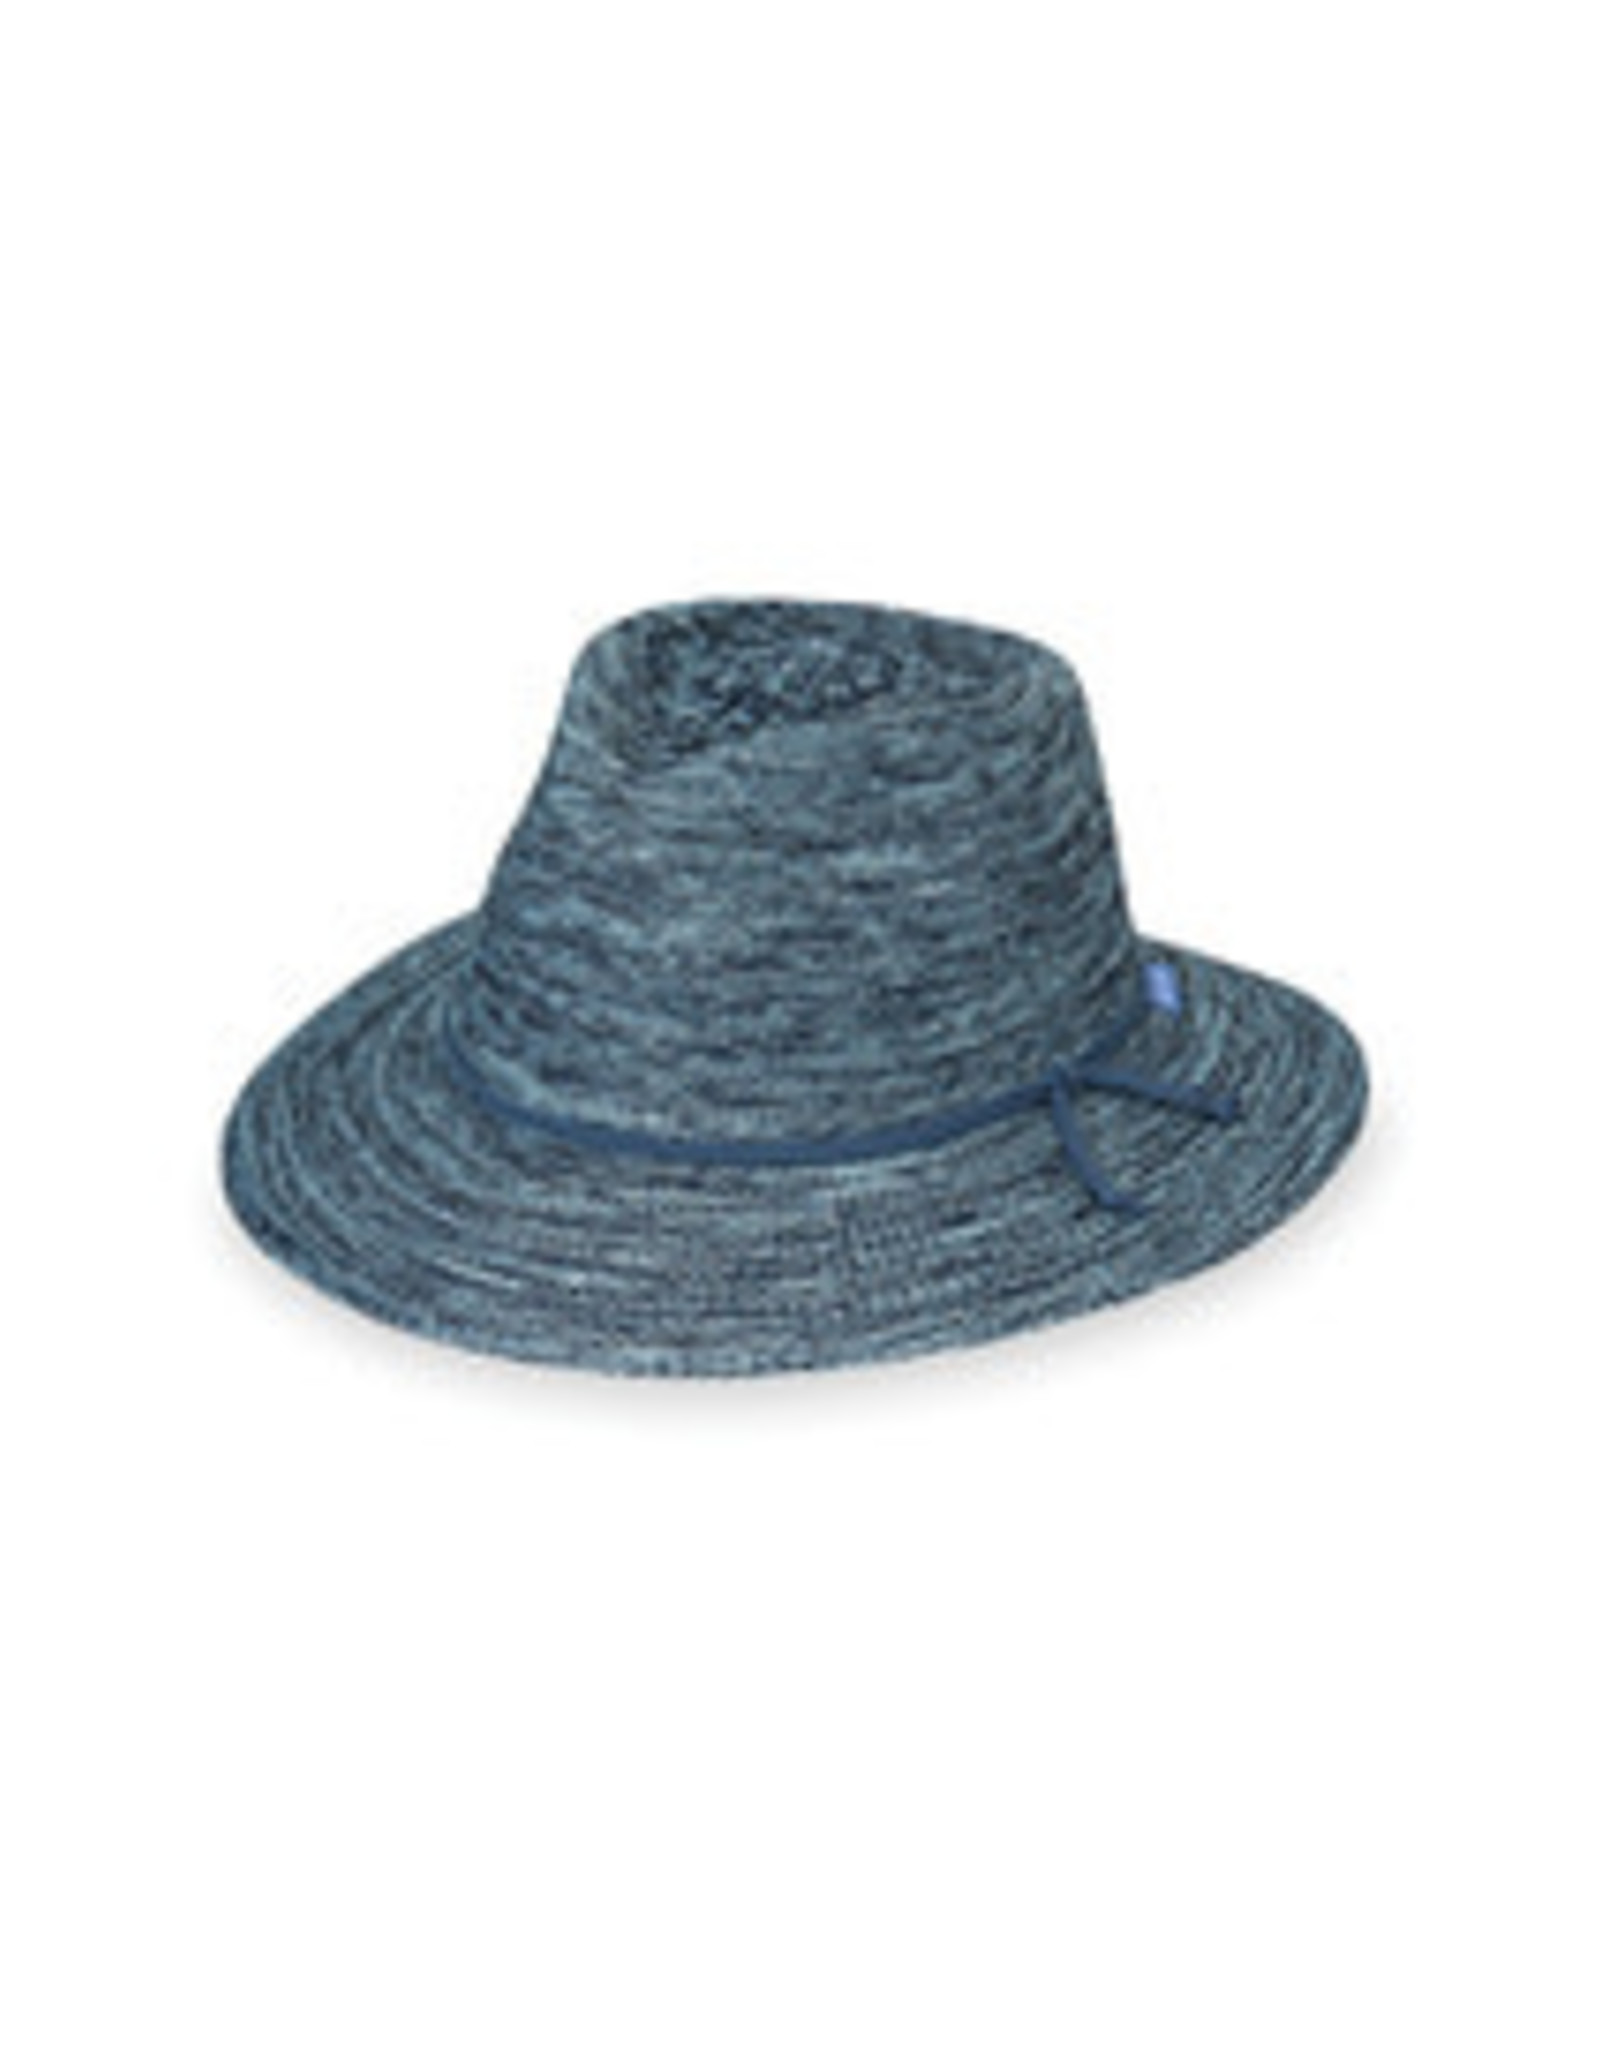 Wallaroo Hat Co Victoria Fedora-Mixed Denim